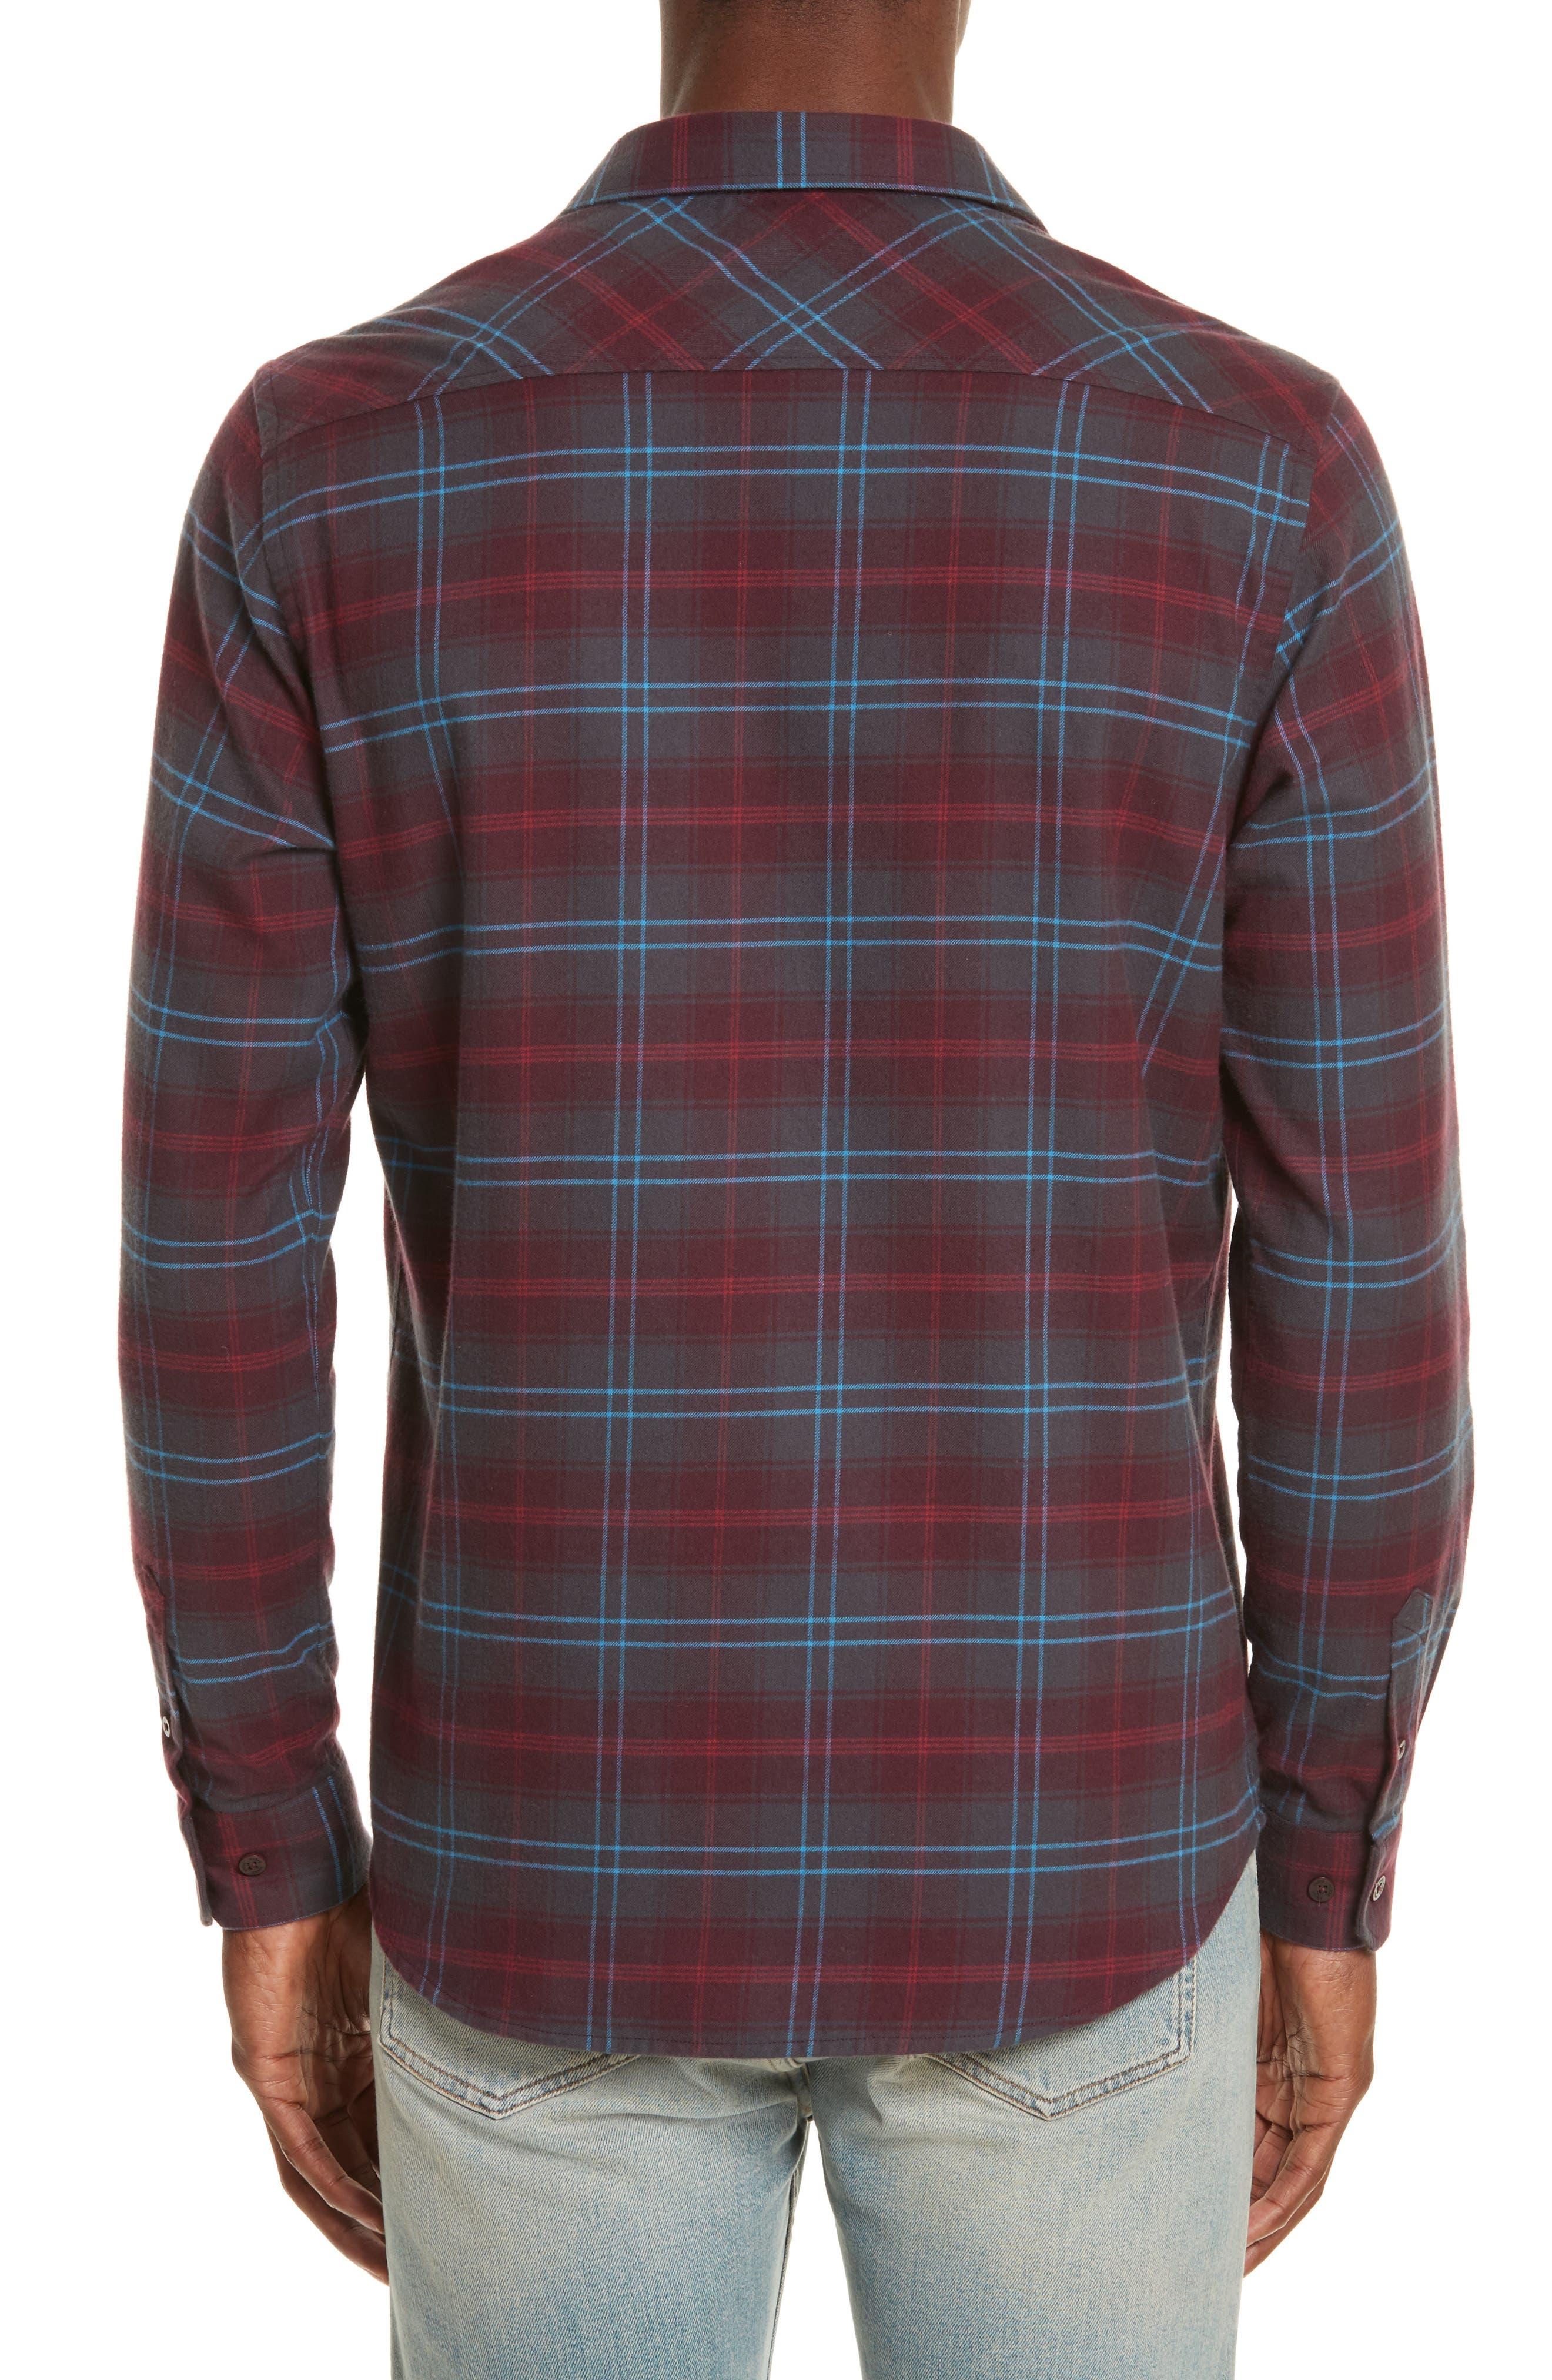 Hans Brushed Check Shirt,                             Alternate thumbnail 2, color,                             Hematite Red